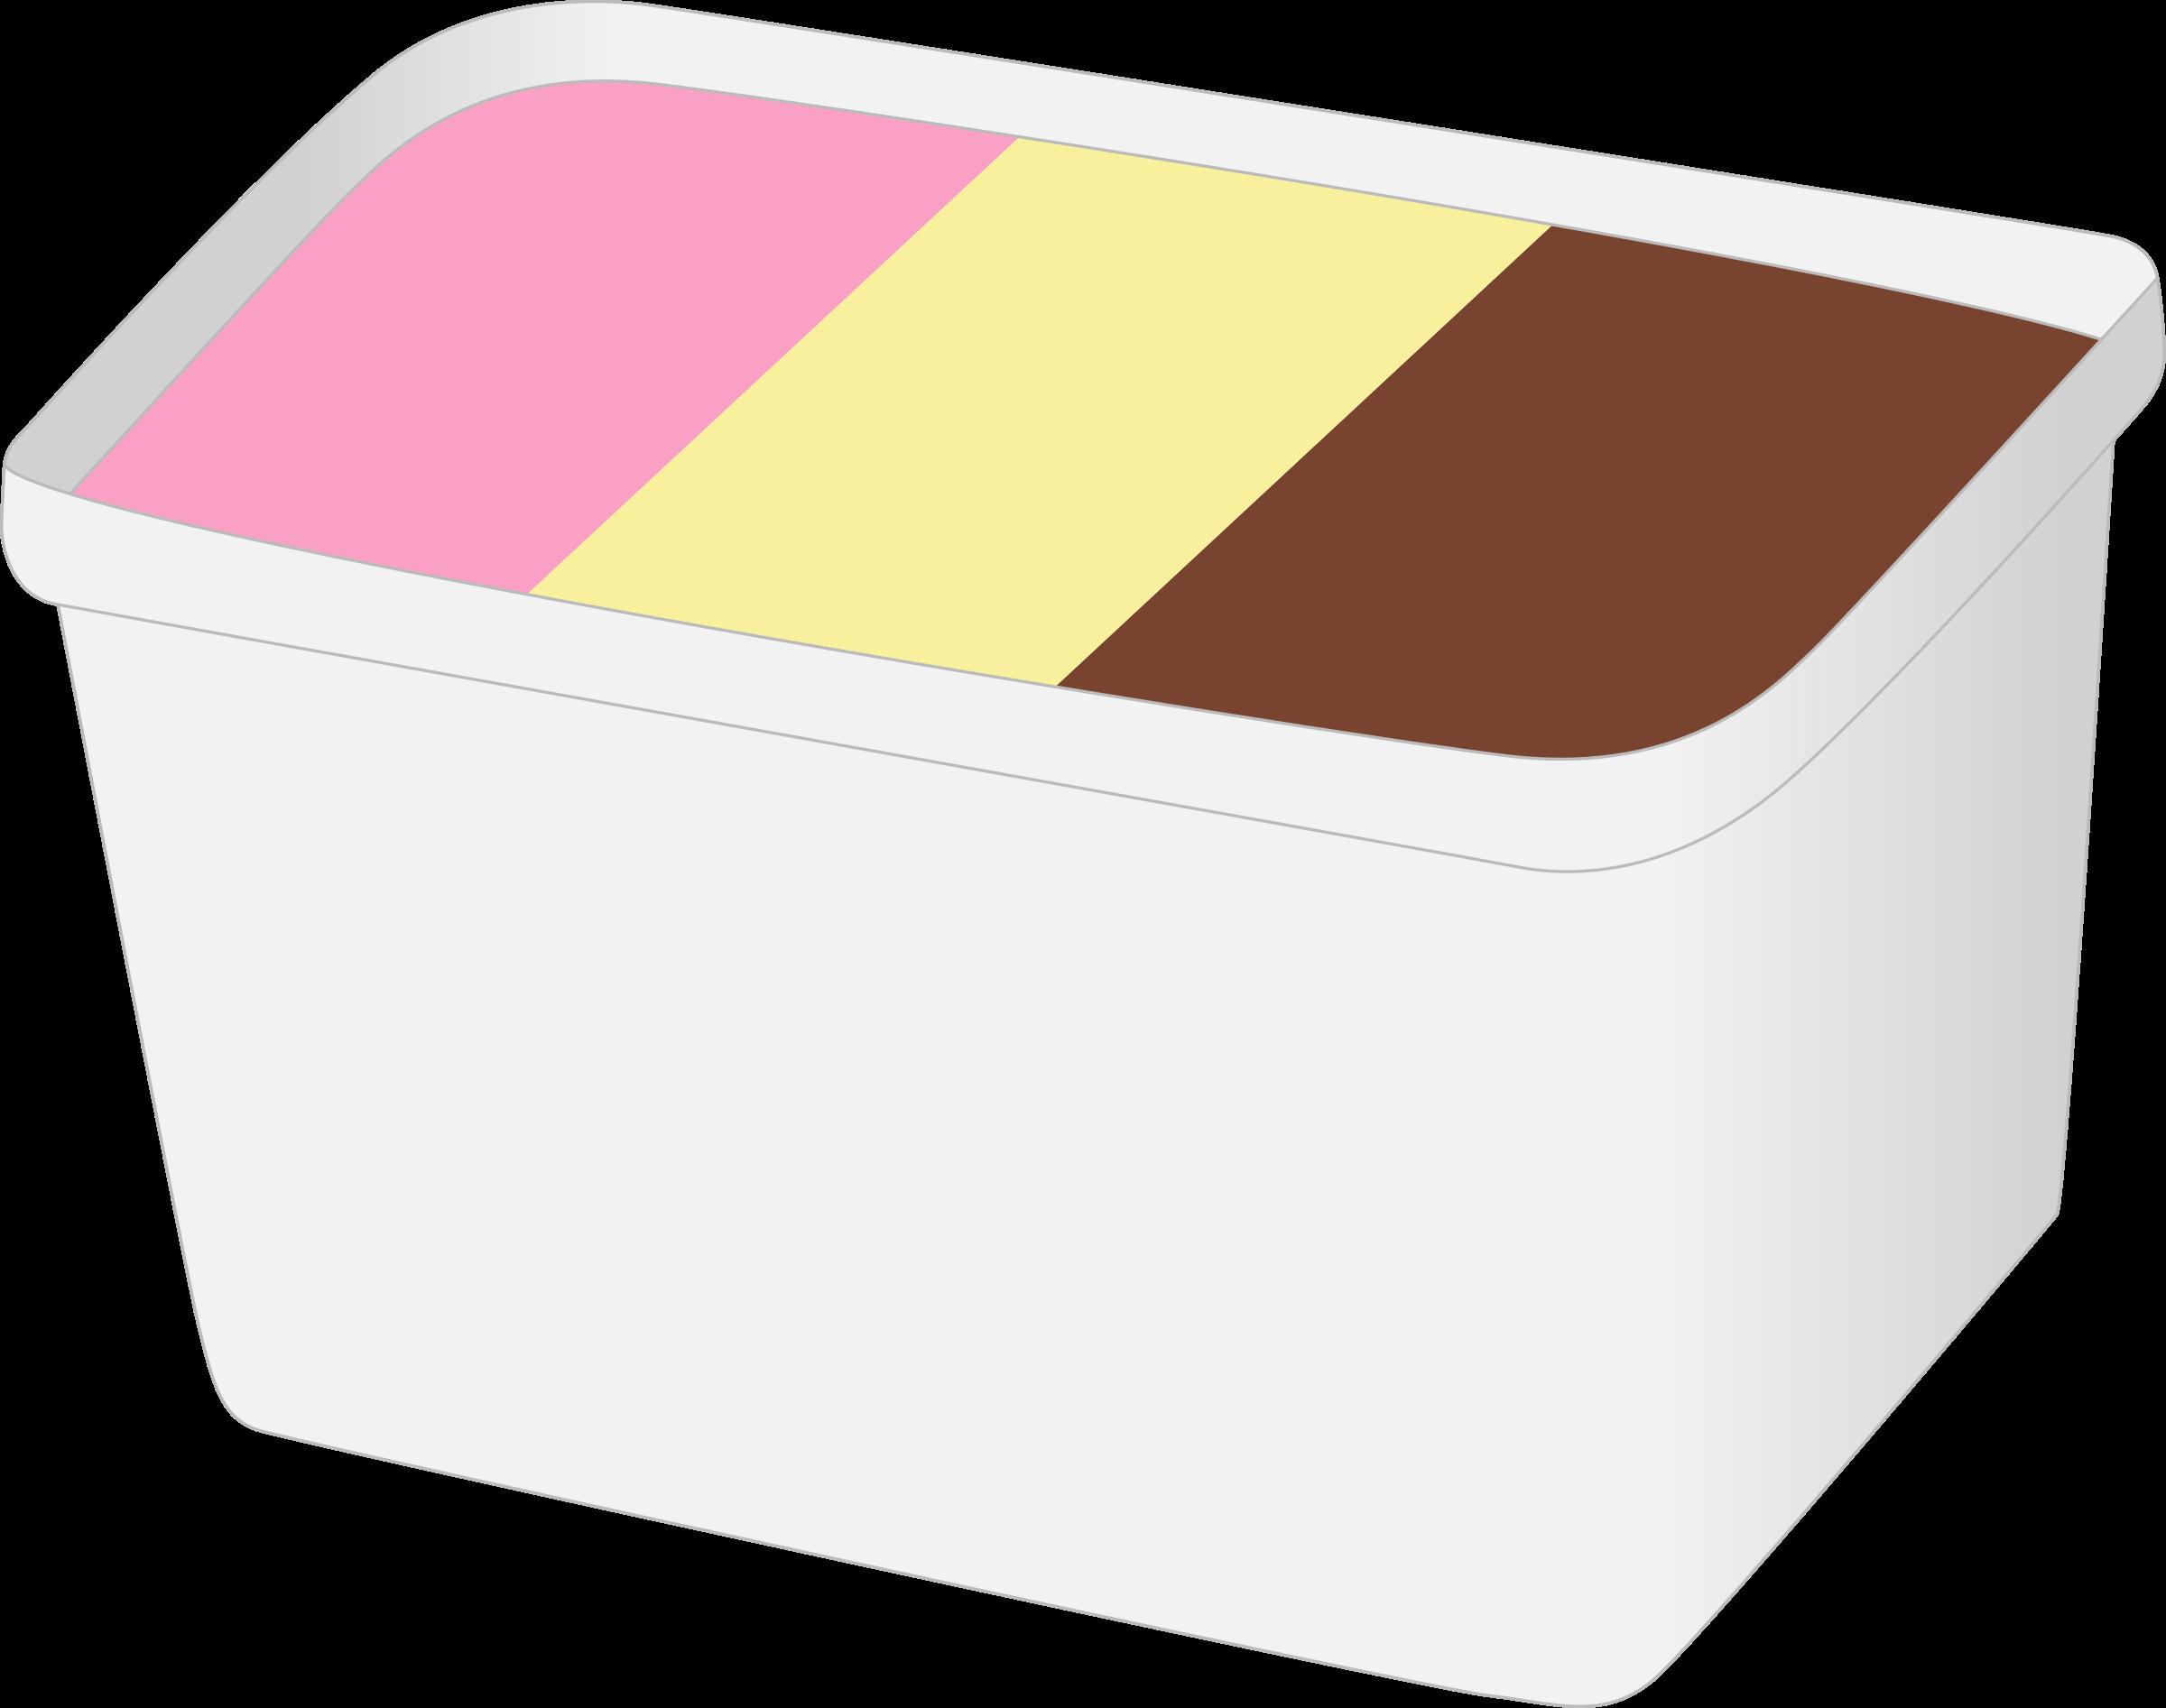 Clipart box ice cream. L big image png